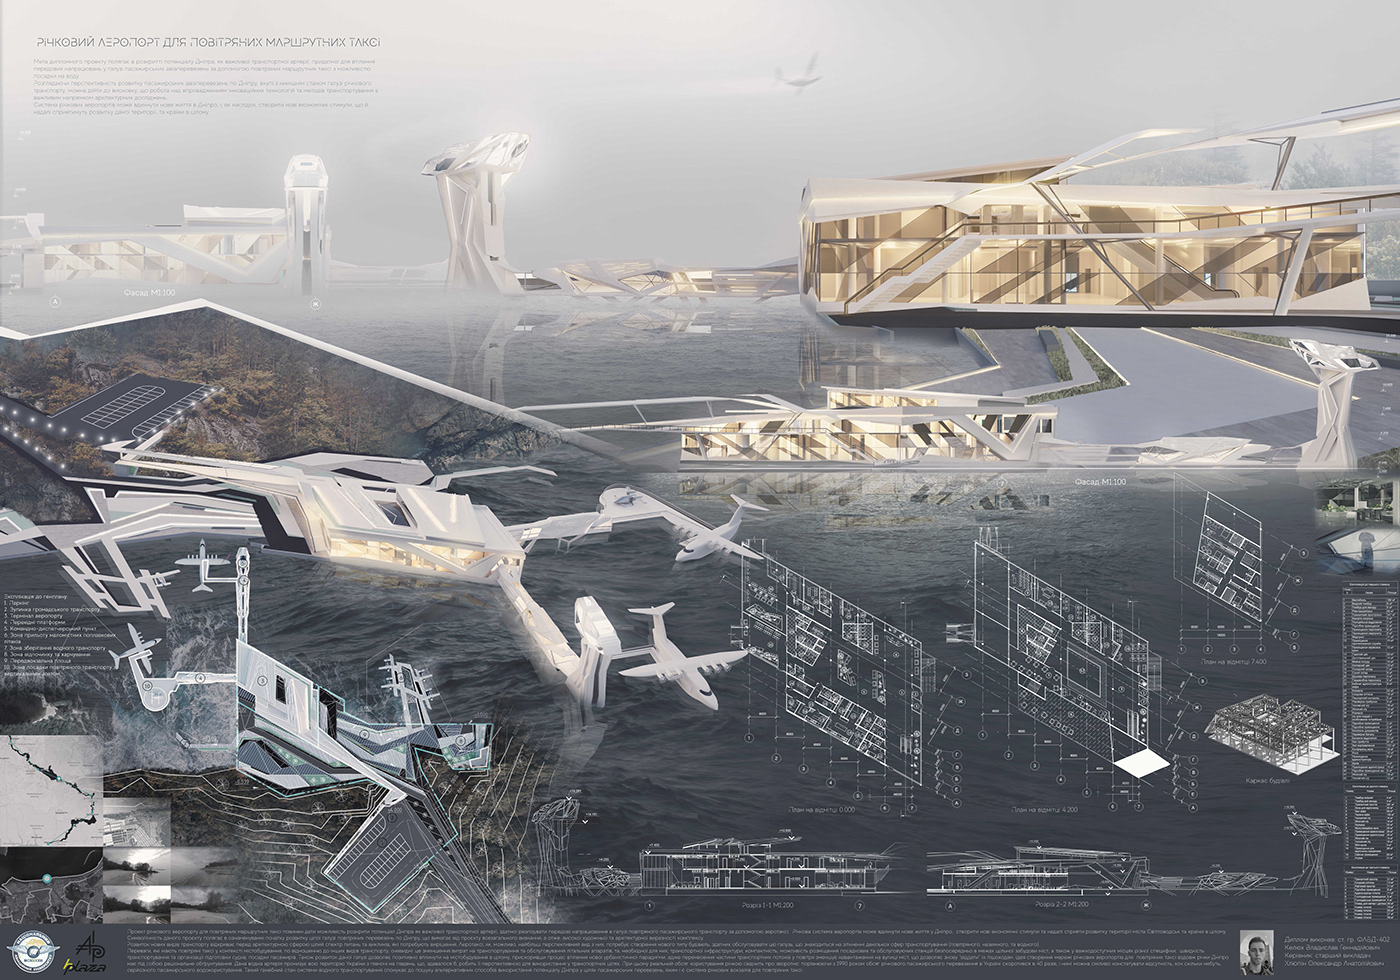 Air Taxi airport architecture bachelor's thesis design Landscape Design parametric architecture Presentation Board riverport